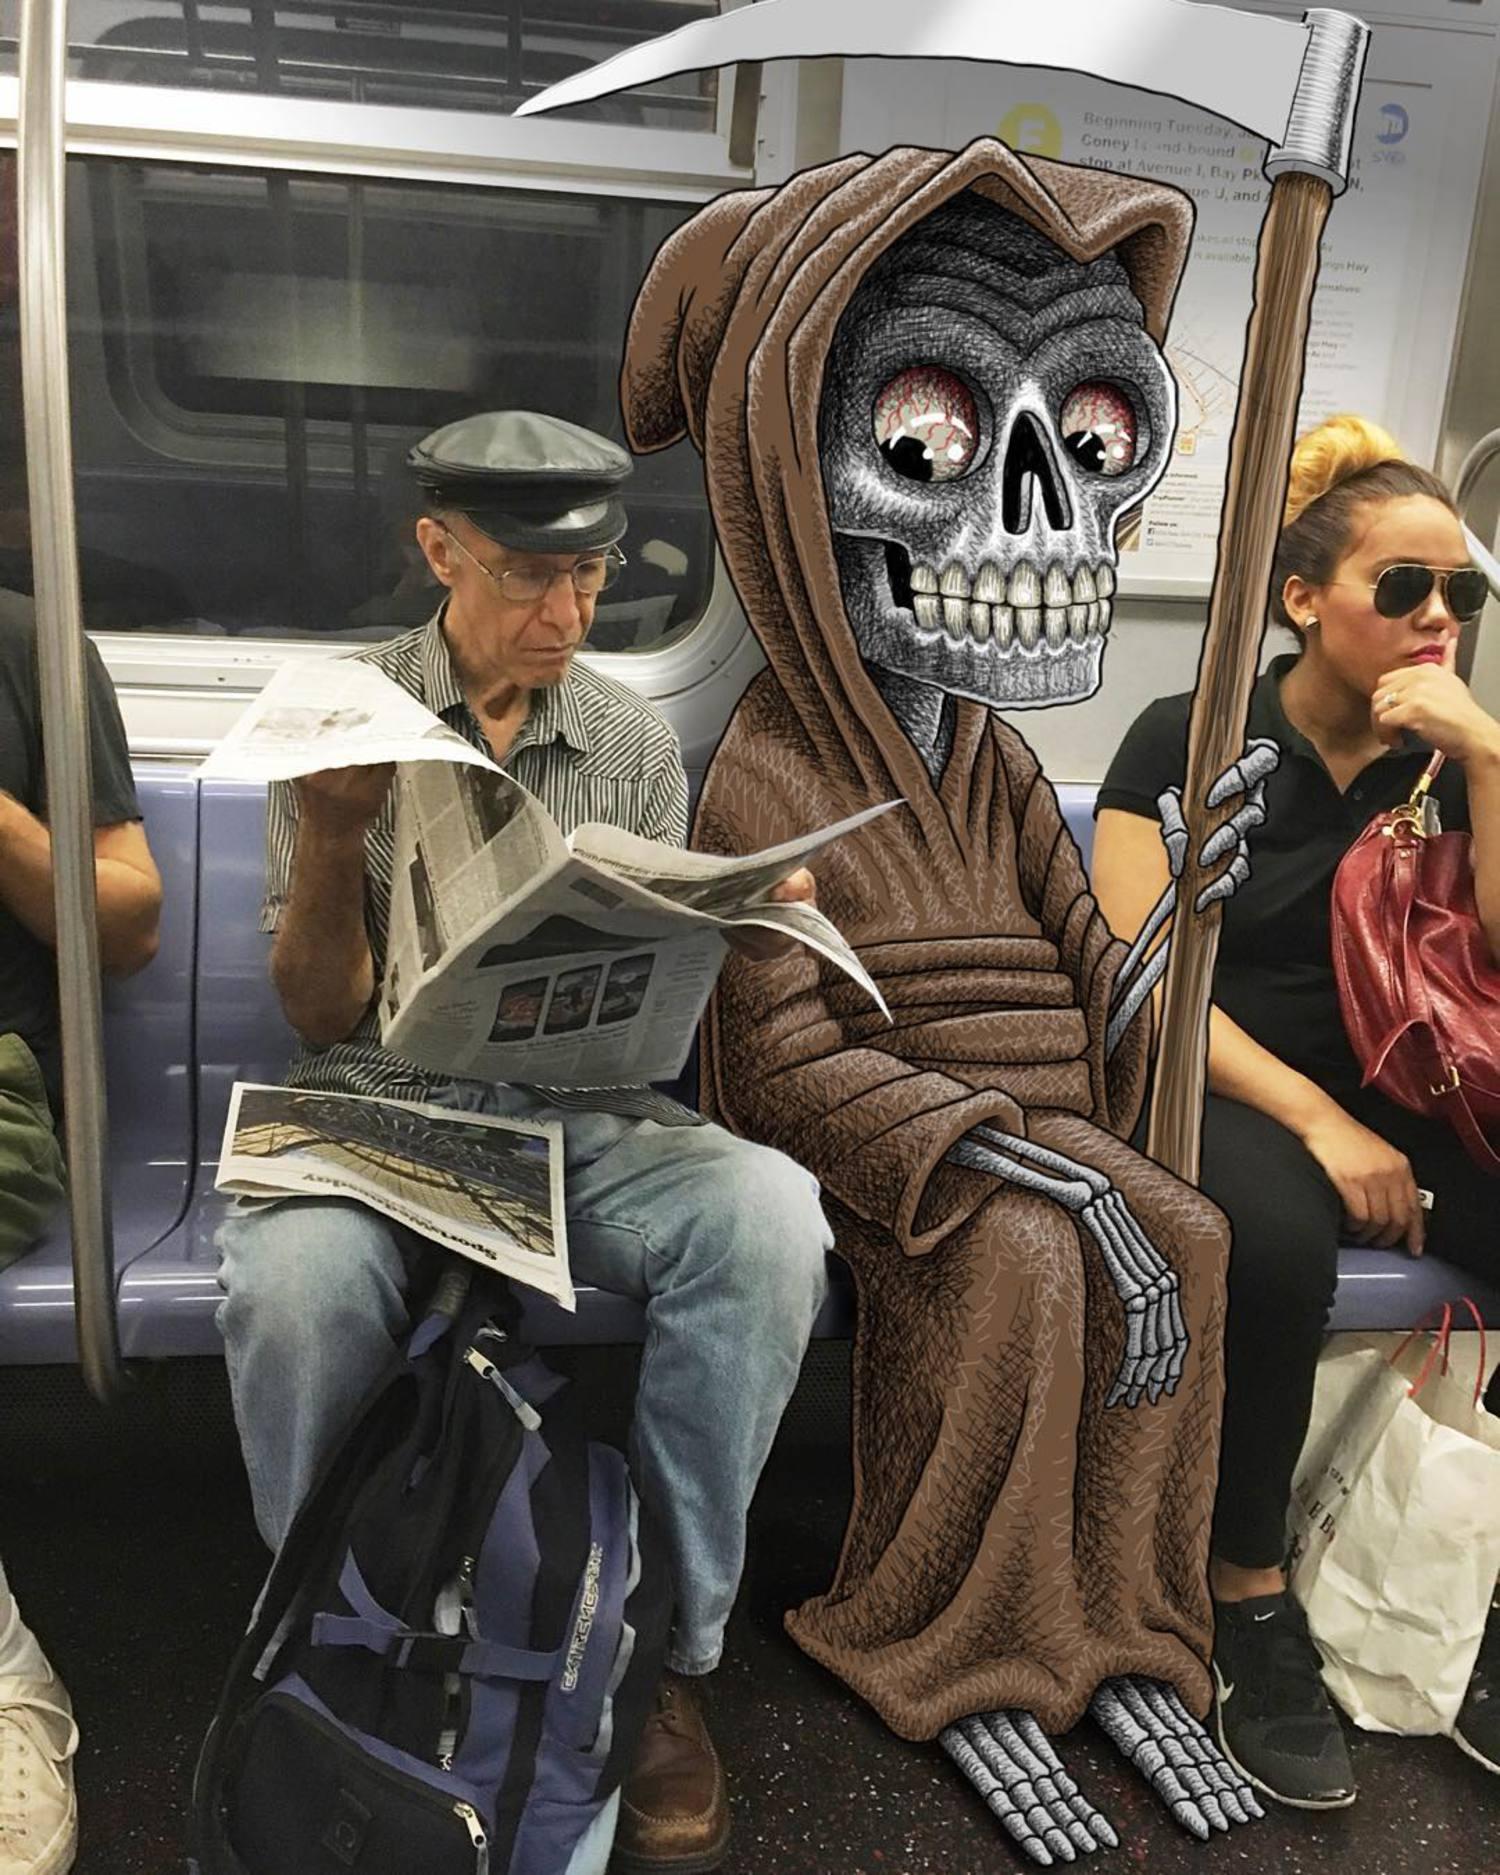 #subwaydoodle #subway #doodle #swd #nyc #printisalmostdead #longliveprint